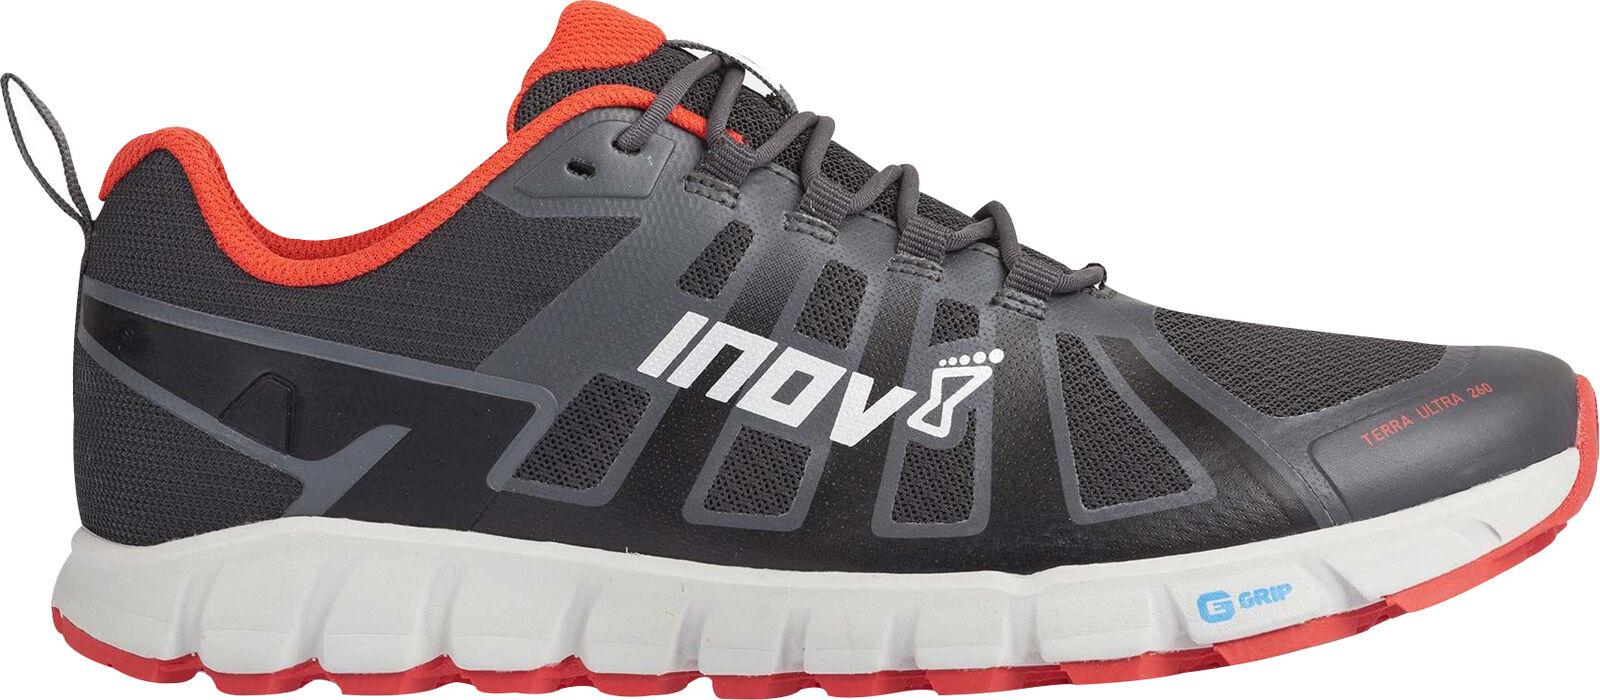 Inov 8 terraultra 260 Para Hombre Trail Running Zapatos-gris